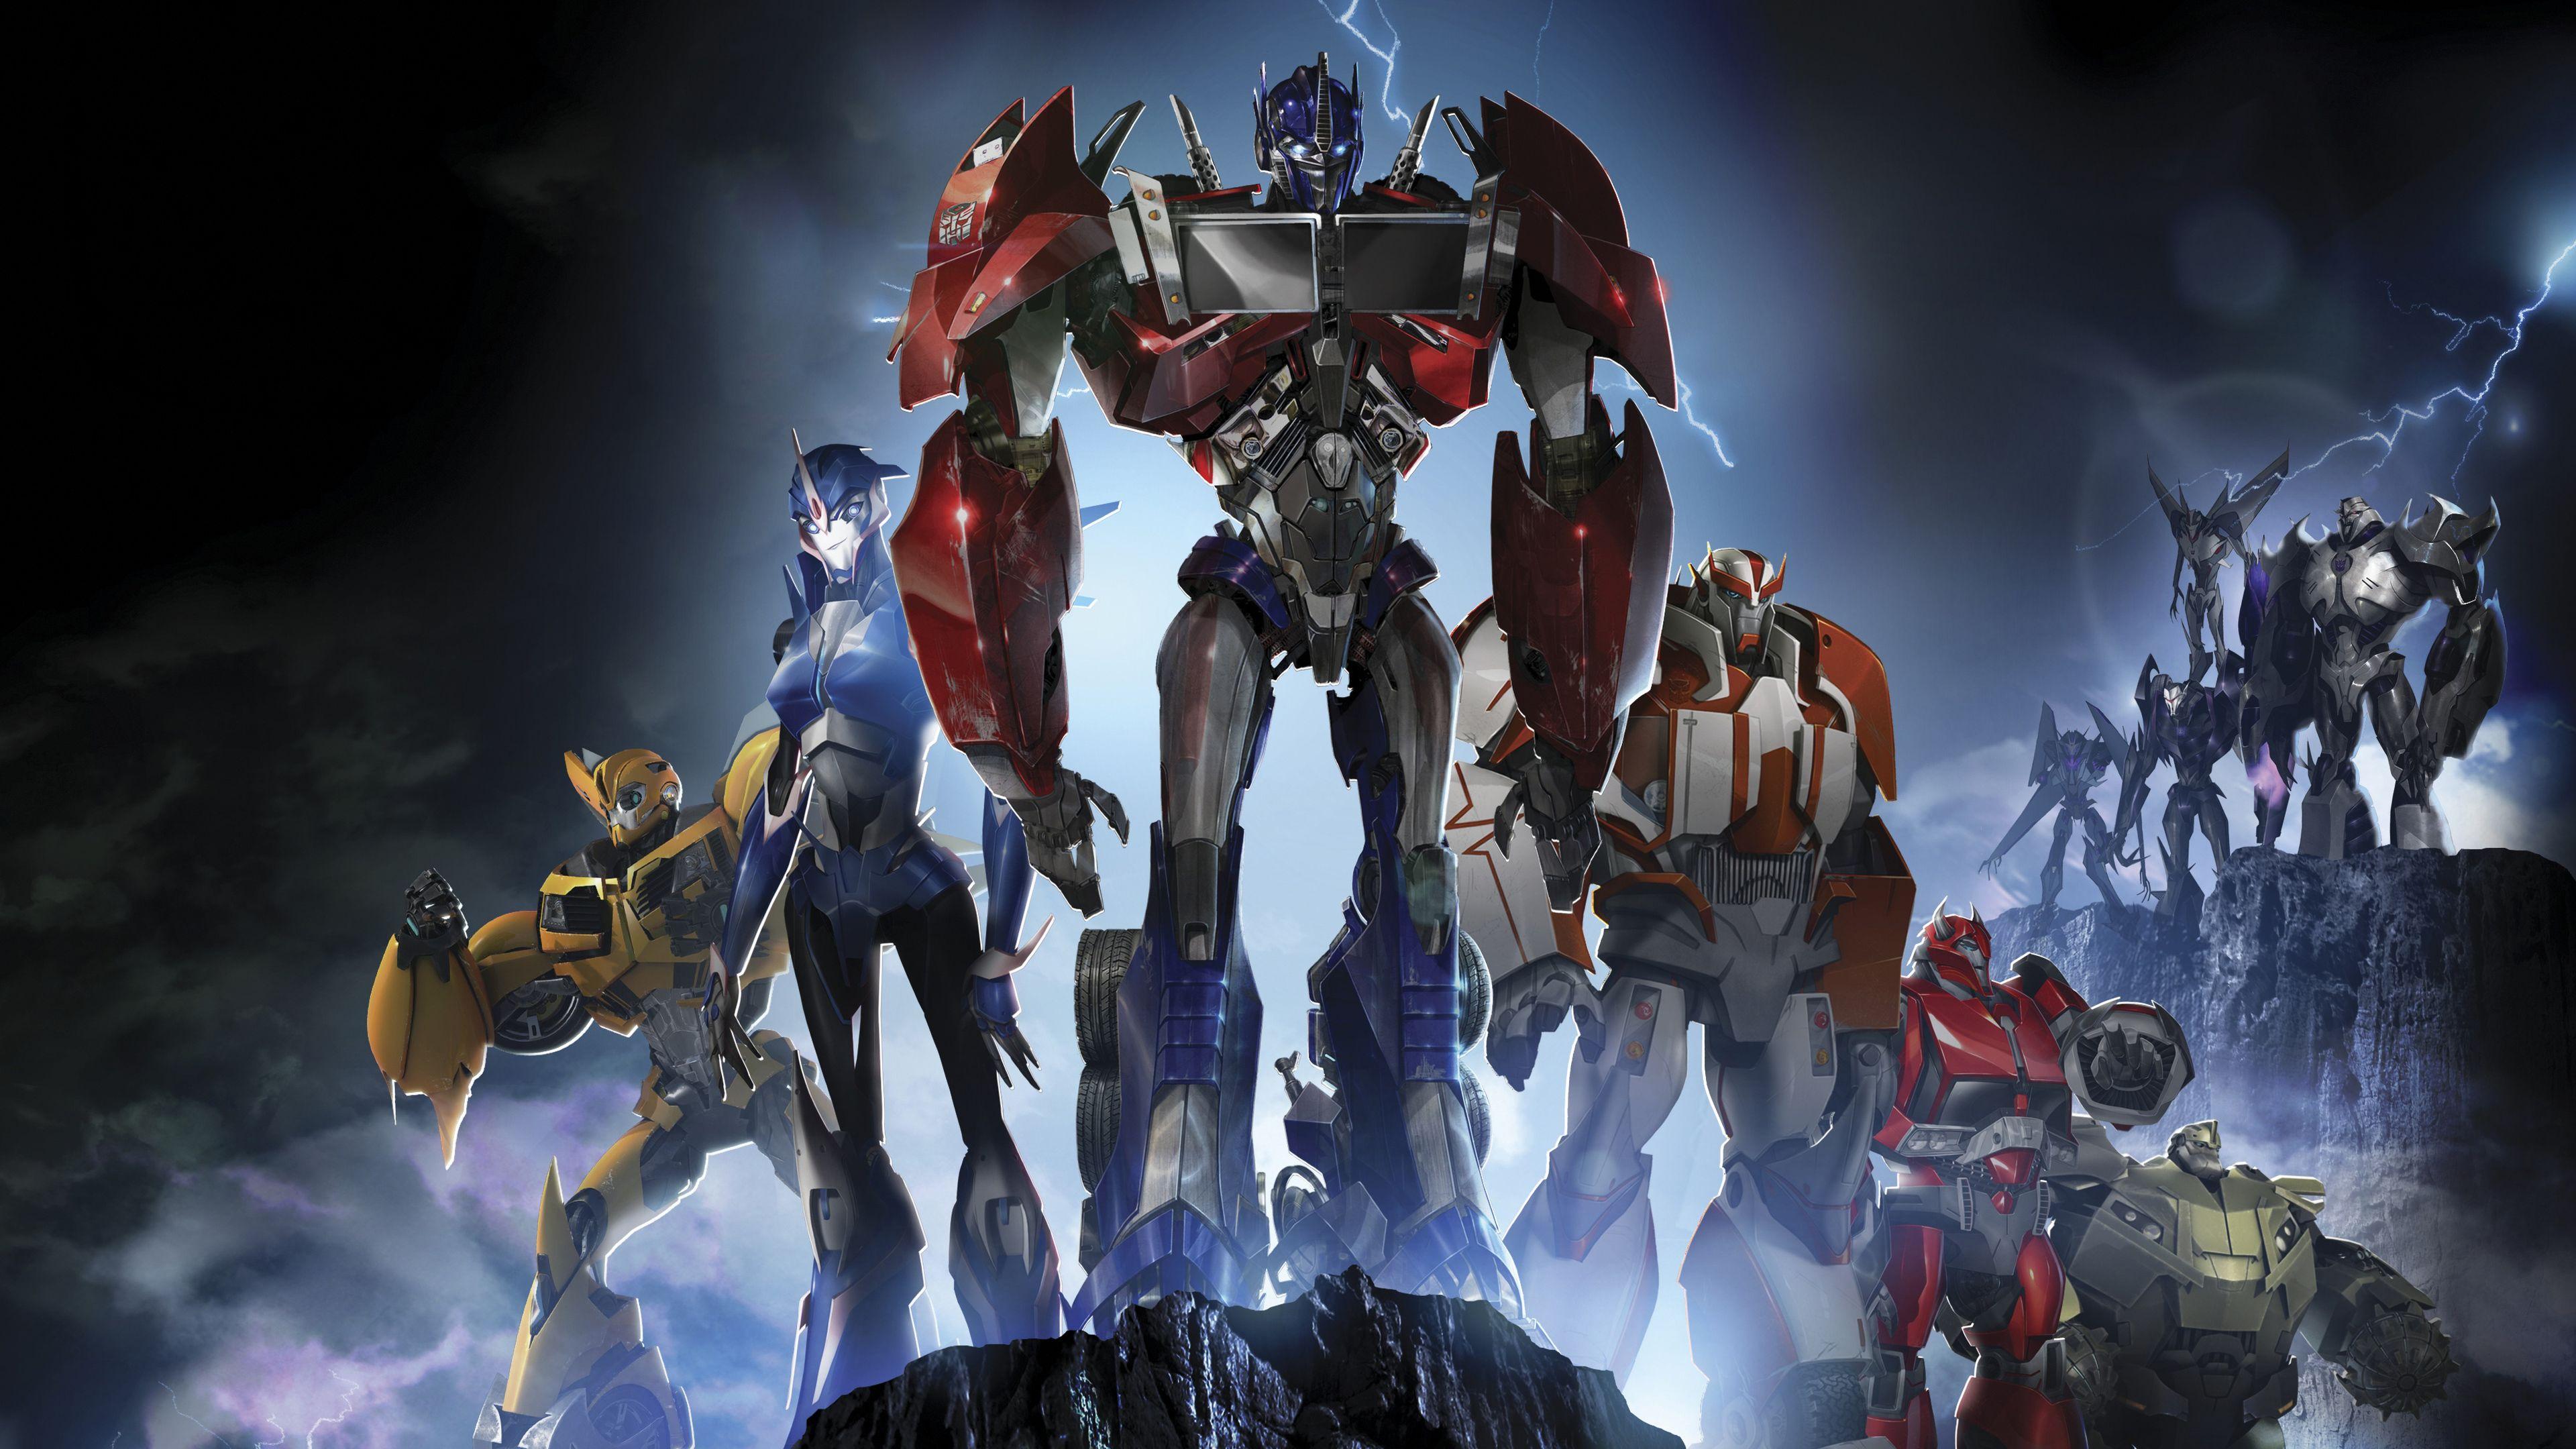 Transformers Prime 4k transformers wallpapers hd wallpapers 4k 3840x2160